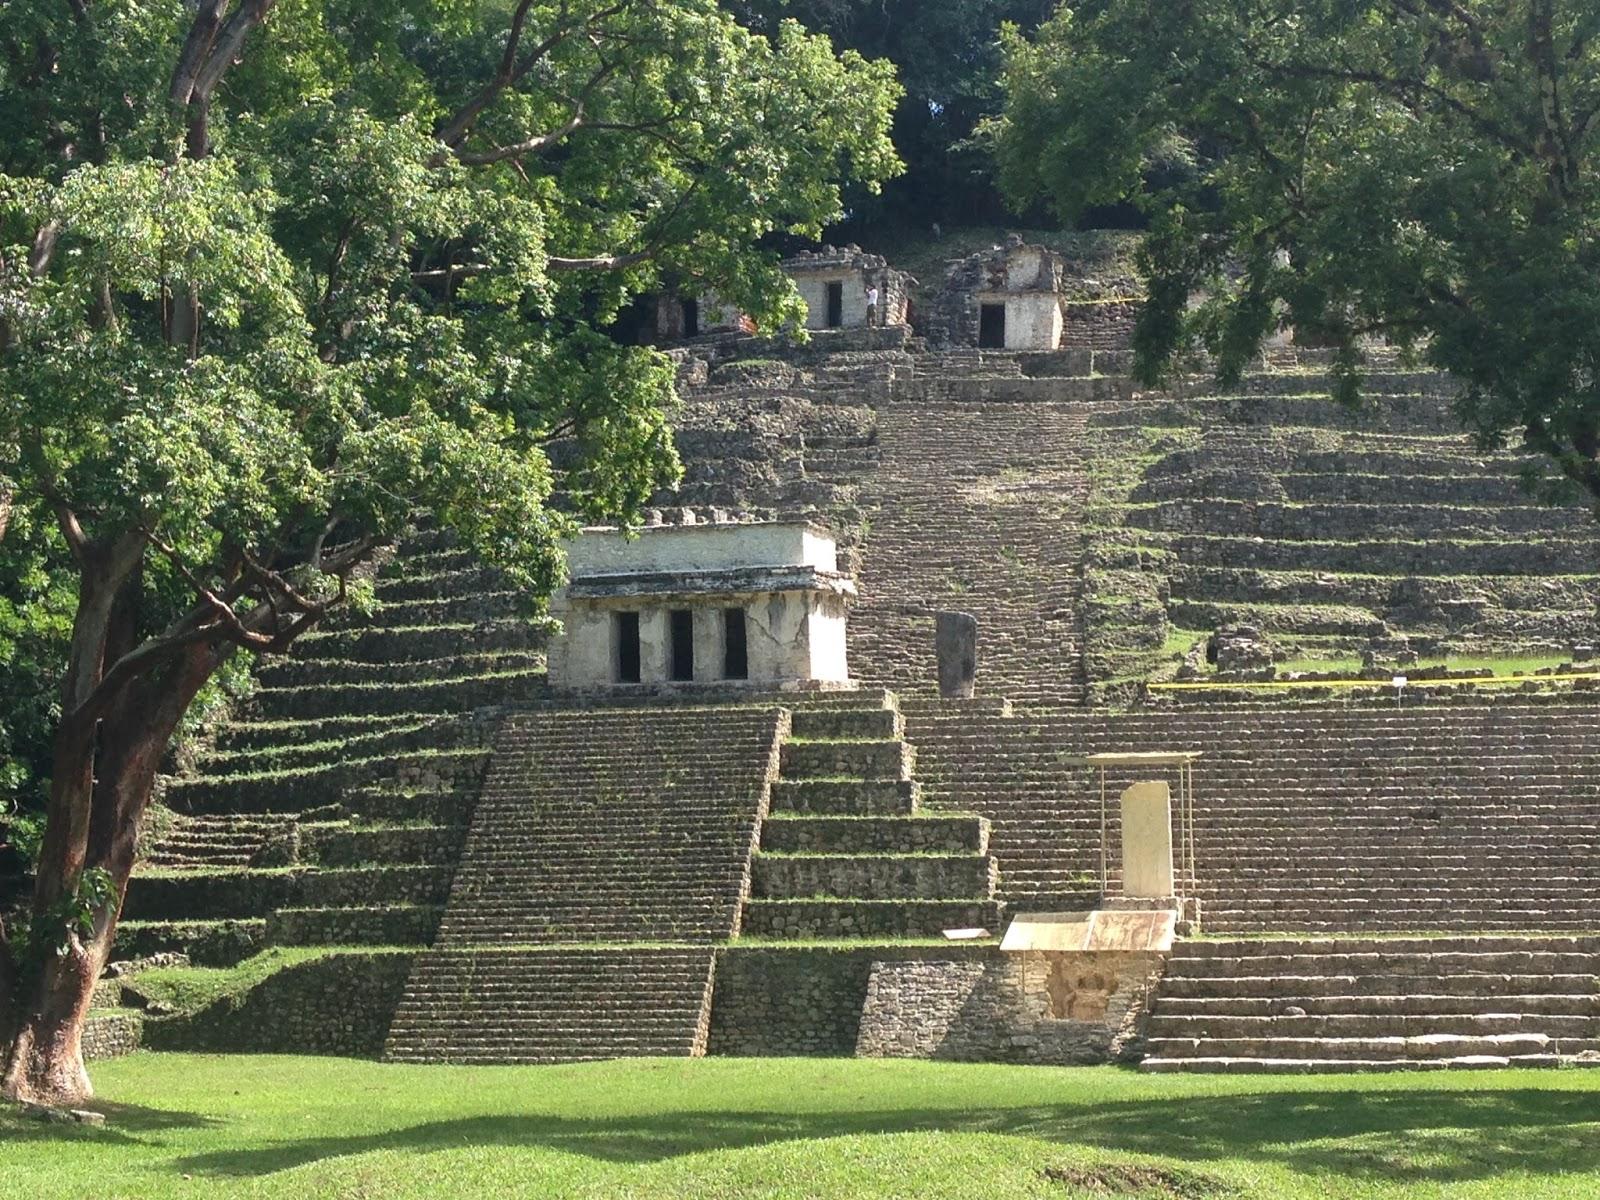 Calendario y cultura maya zona arqueol gica de bonampak for El mural de bonampak